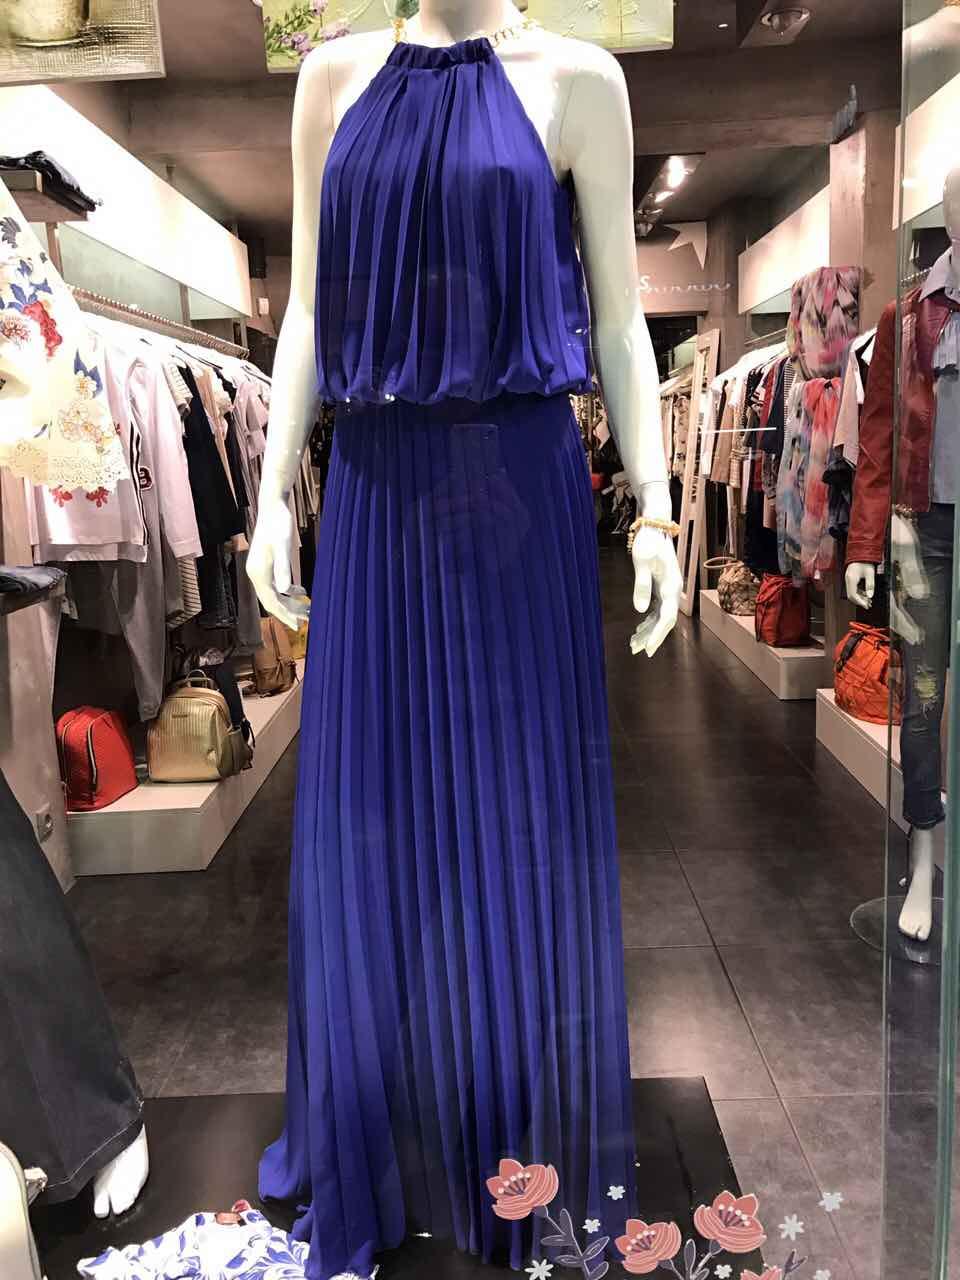 e9c15e998f97 Να ξεκαθαρίσουμε κατ  αρχή ότι σε τέτοιες περιστάσεις η ιδανικότερη επιλογή  είναι το φόρεμα γιατί είναι άκρως θηλυκό και έχετε πάρα πολλές επιλογές.